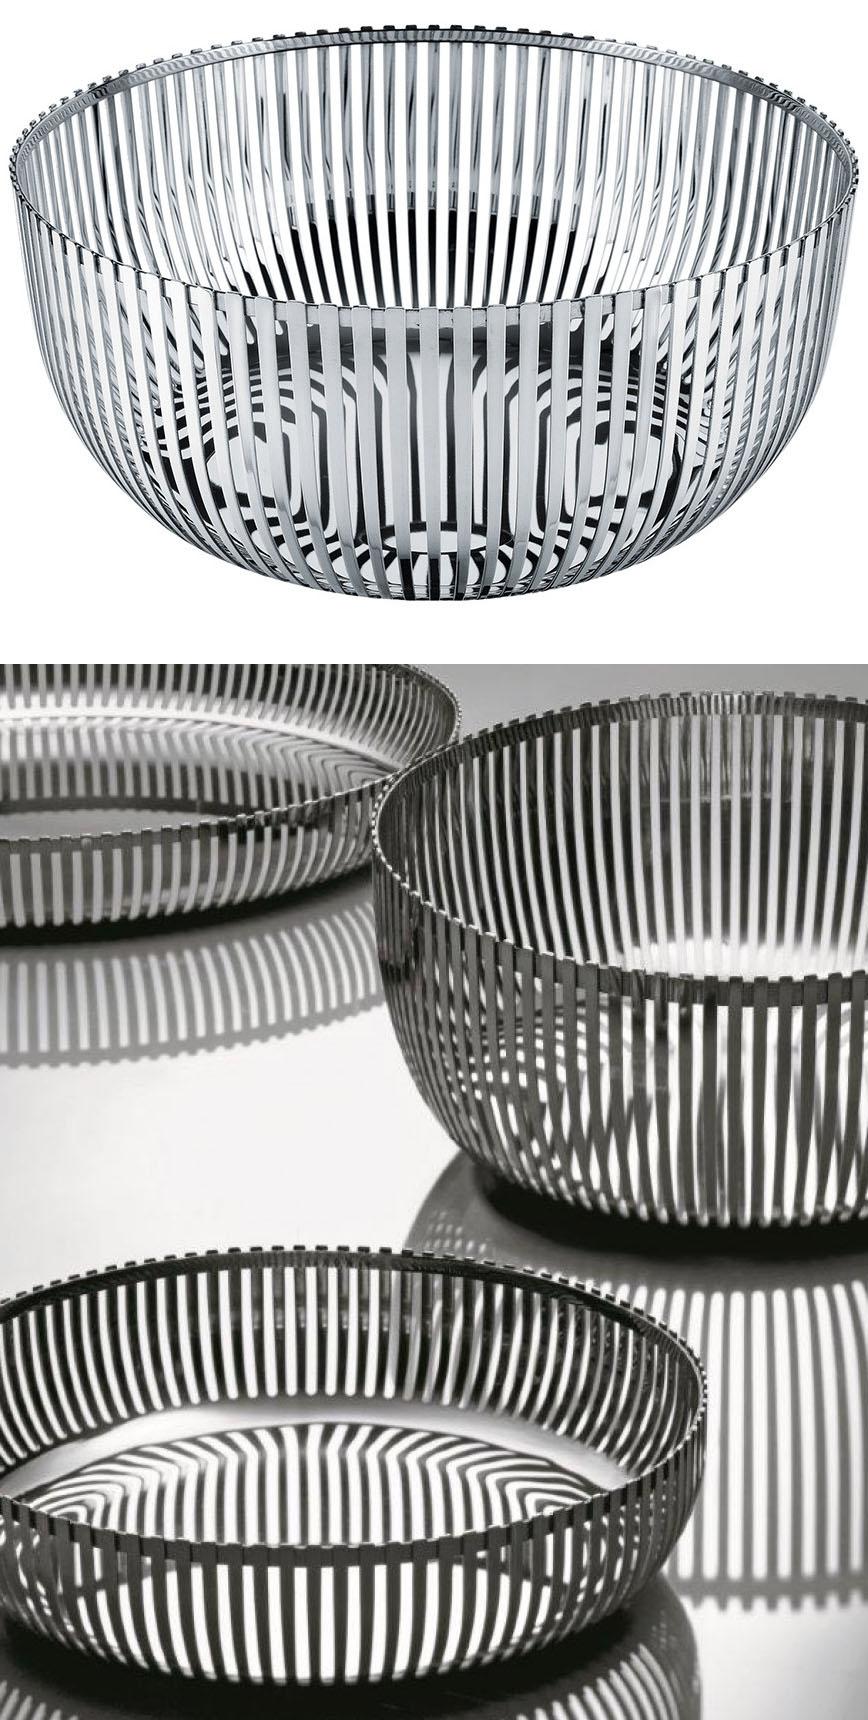 Alessi charpin fruit bowl basket 9 5 inch dia pch05 24 nova68 modern design - Alessi fruit bowl ...